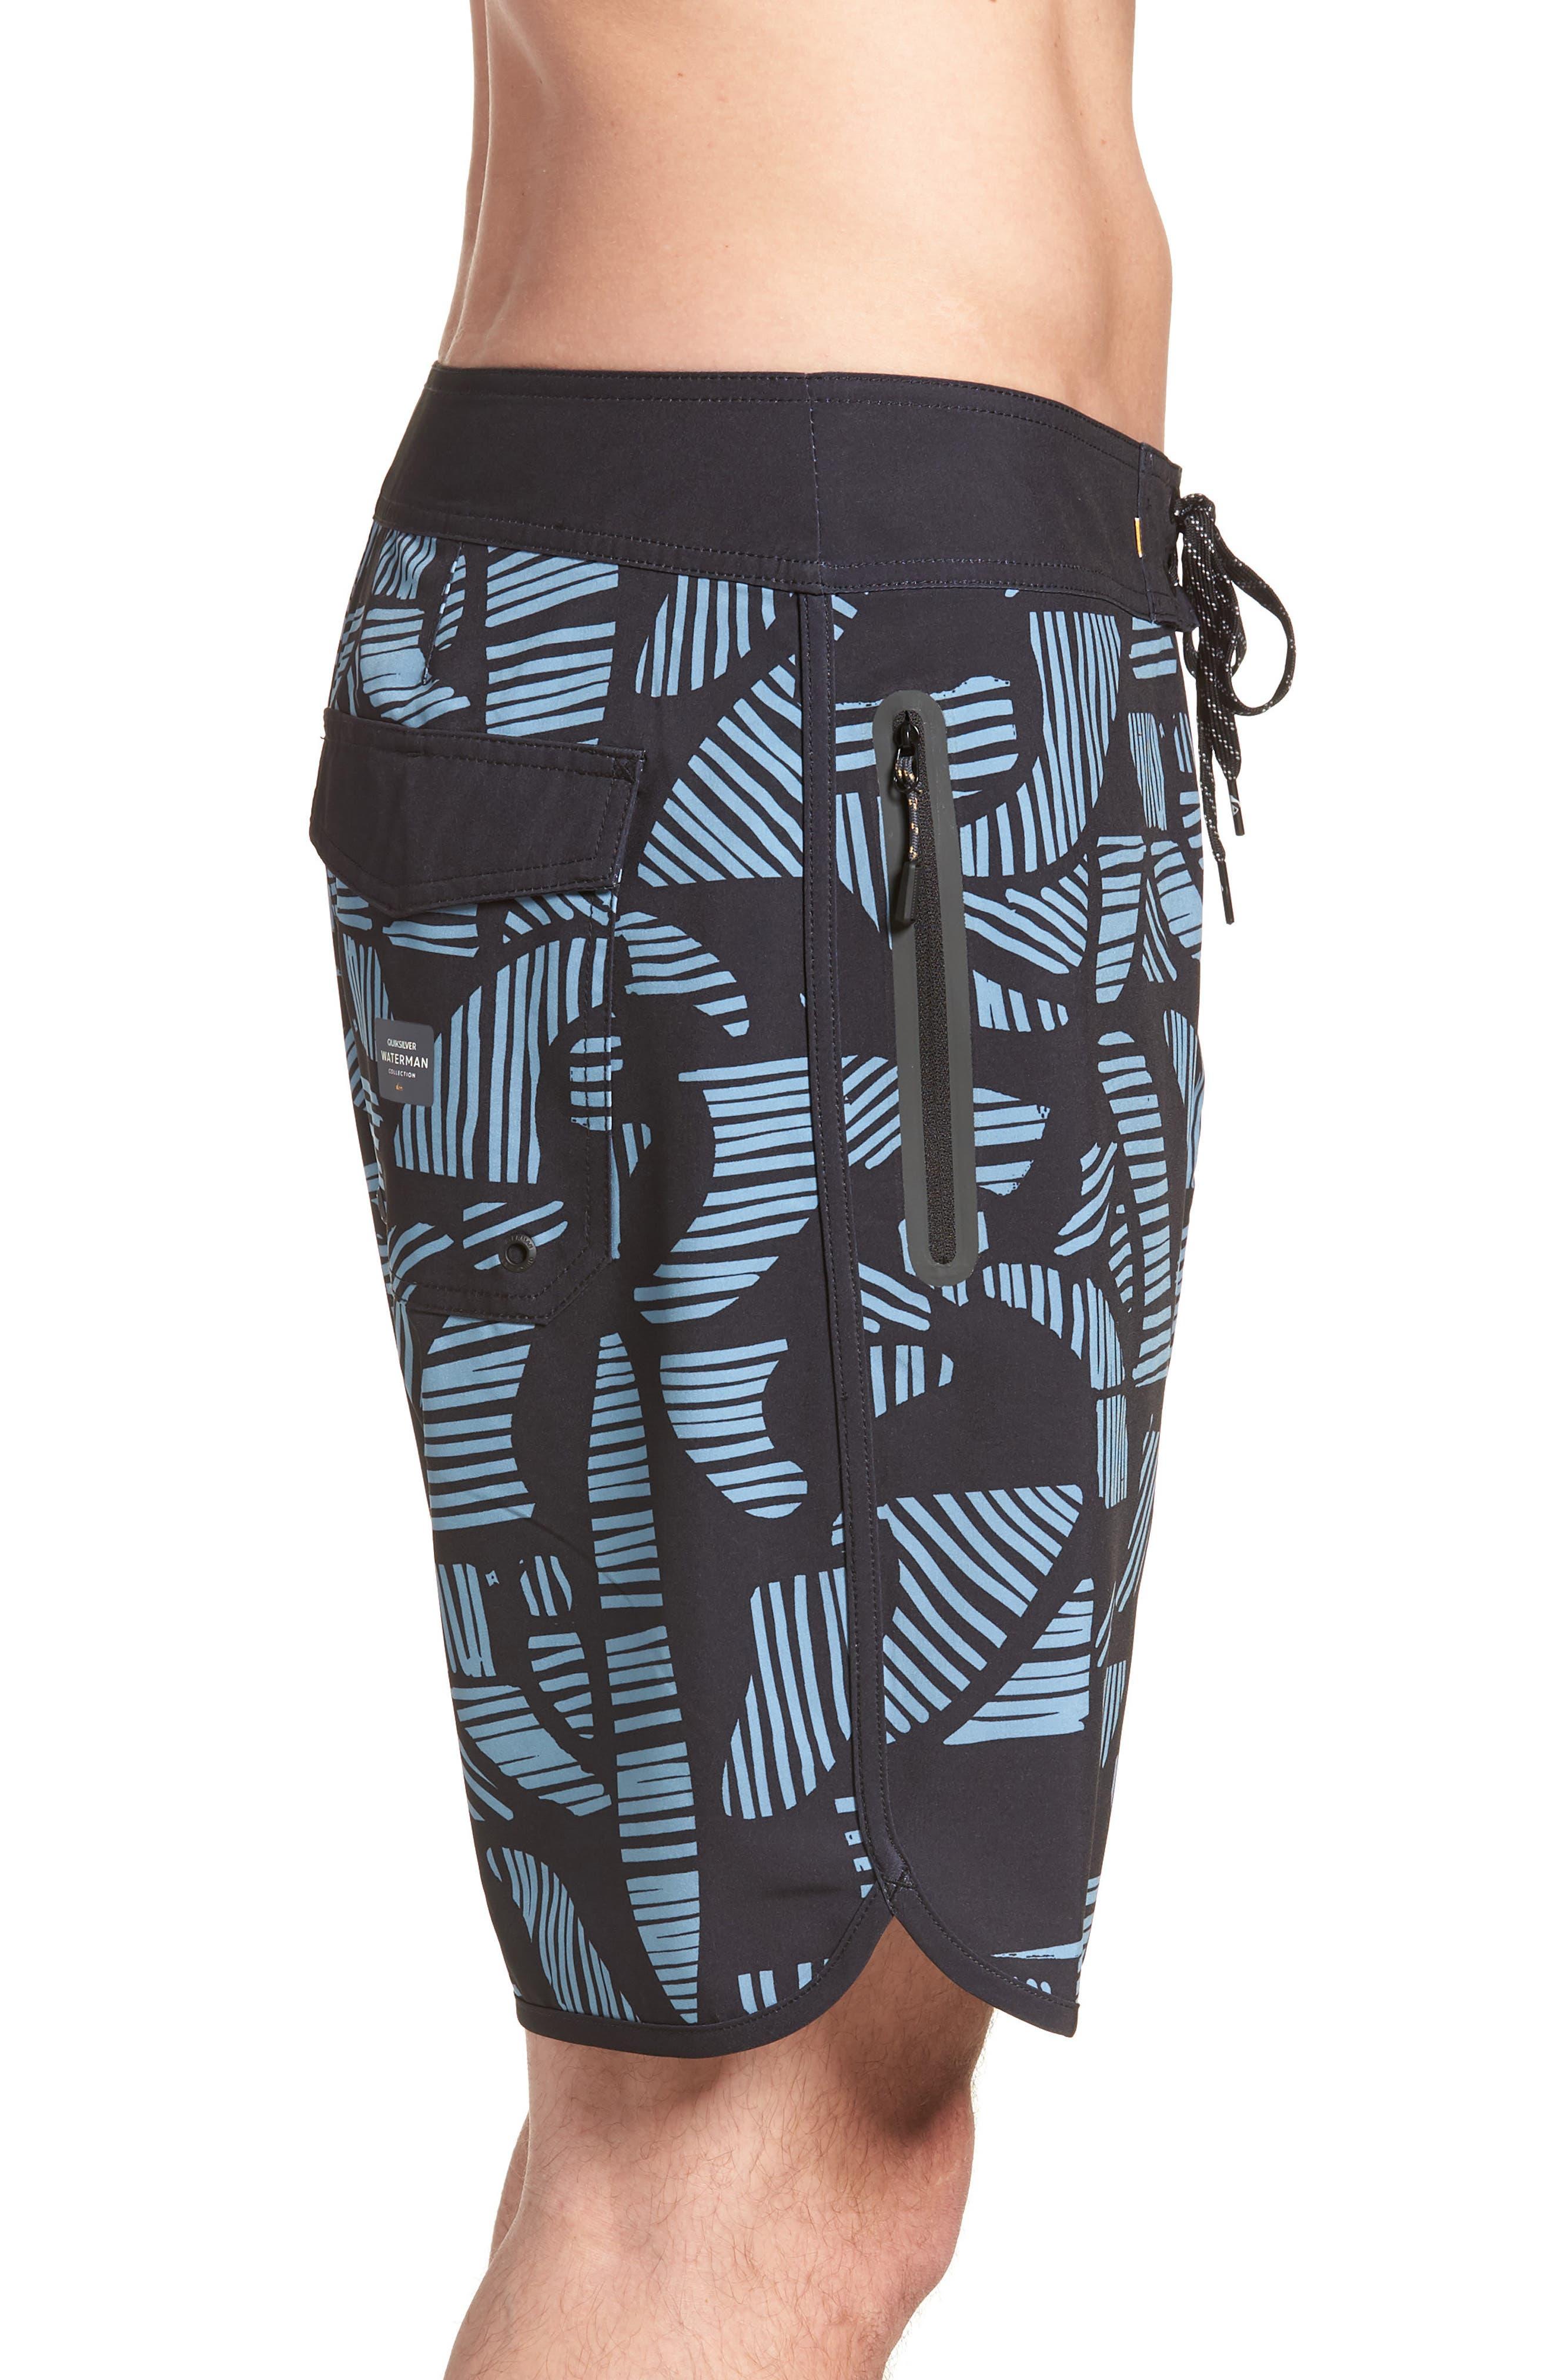 Odysea Board Shorts,                             Alternate thumbnail 3, color,                             Black